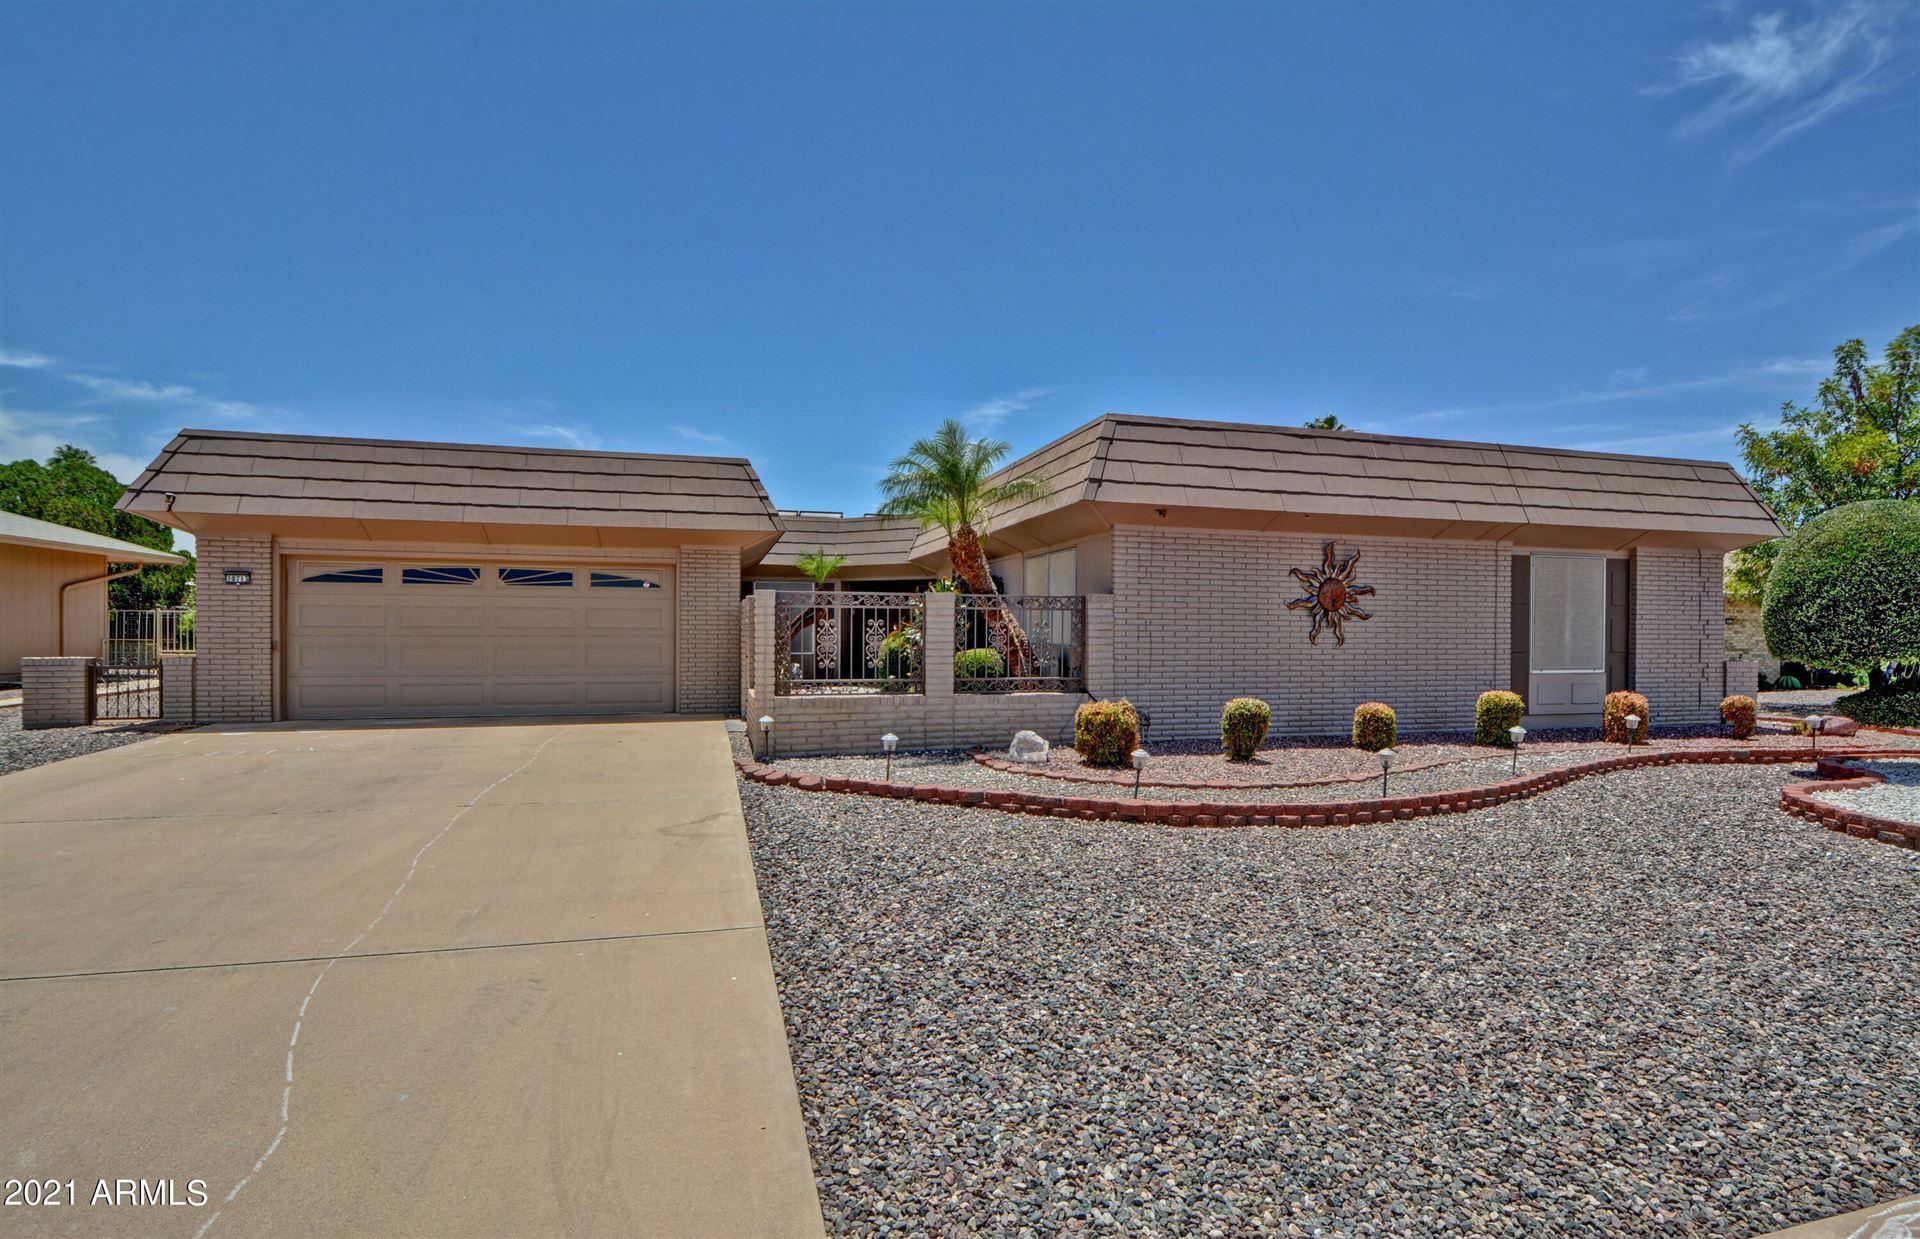 Photo of 10713 W MANZANITA Drive, Sun City, AZ 85373 (MLS # 6247091)